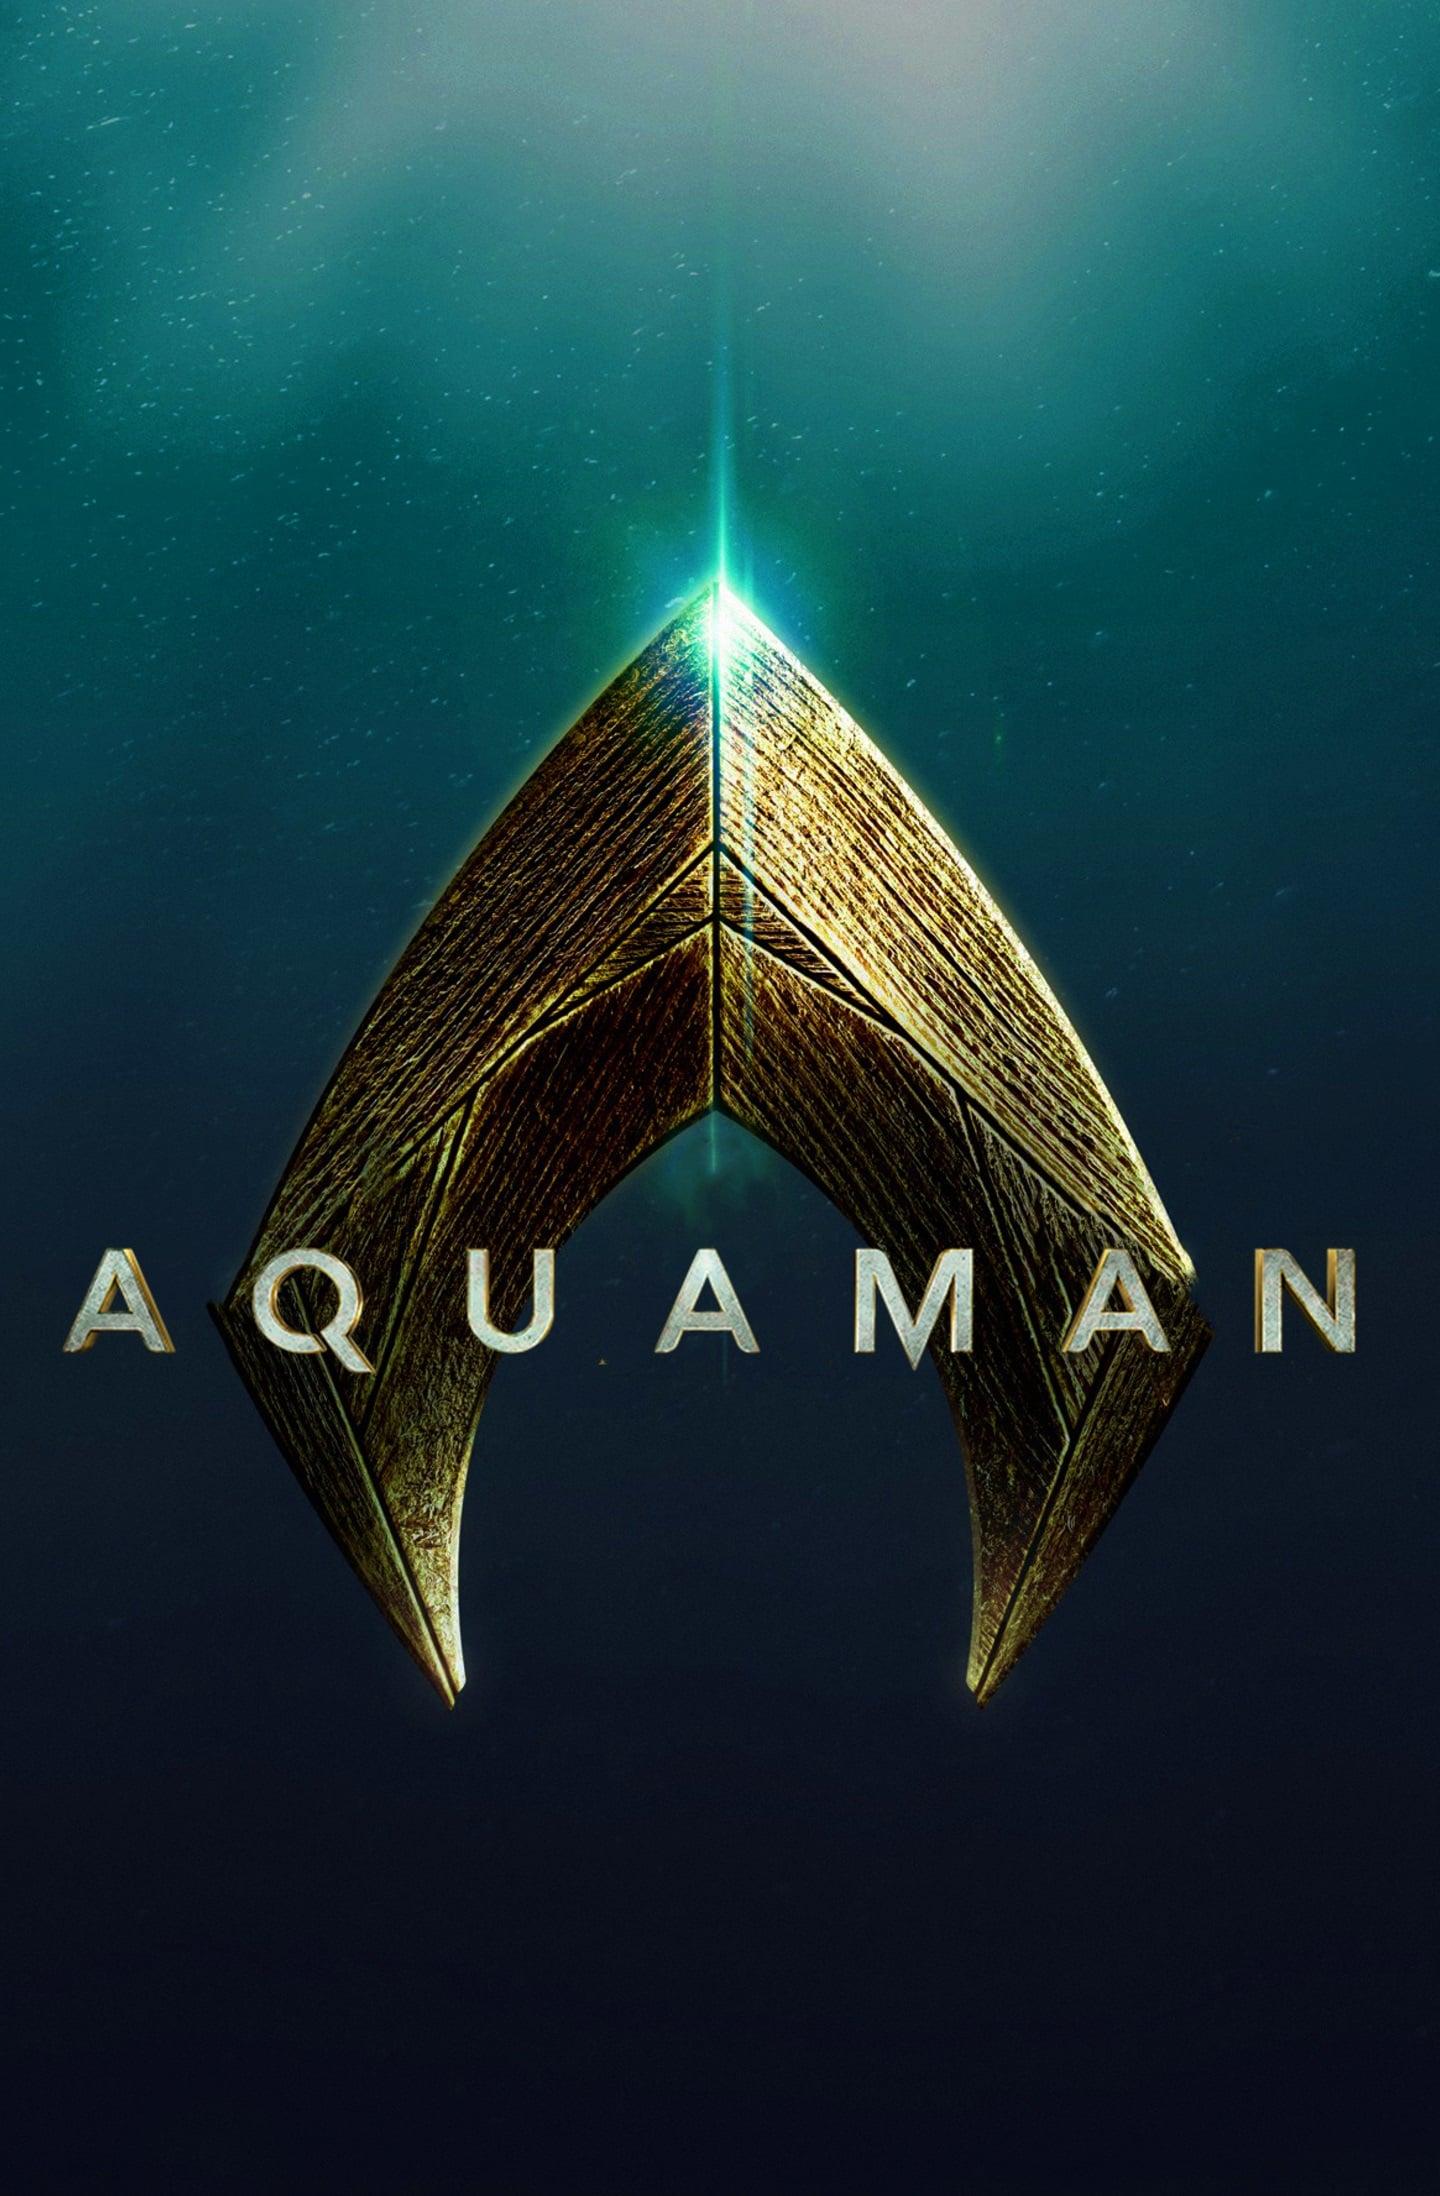 Regarder Aquaman en streaming gratuit